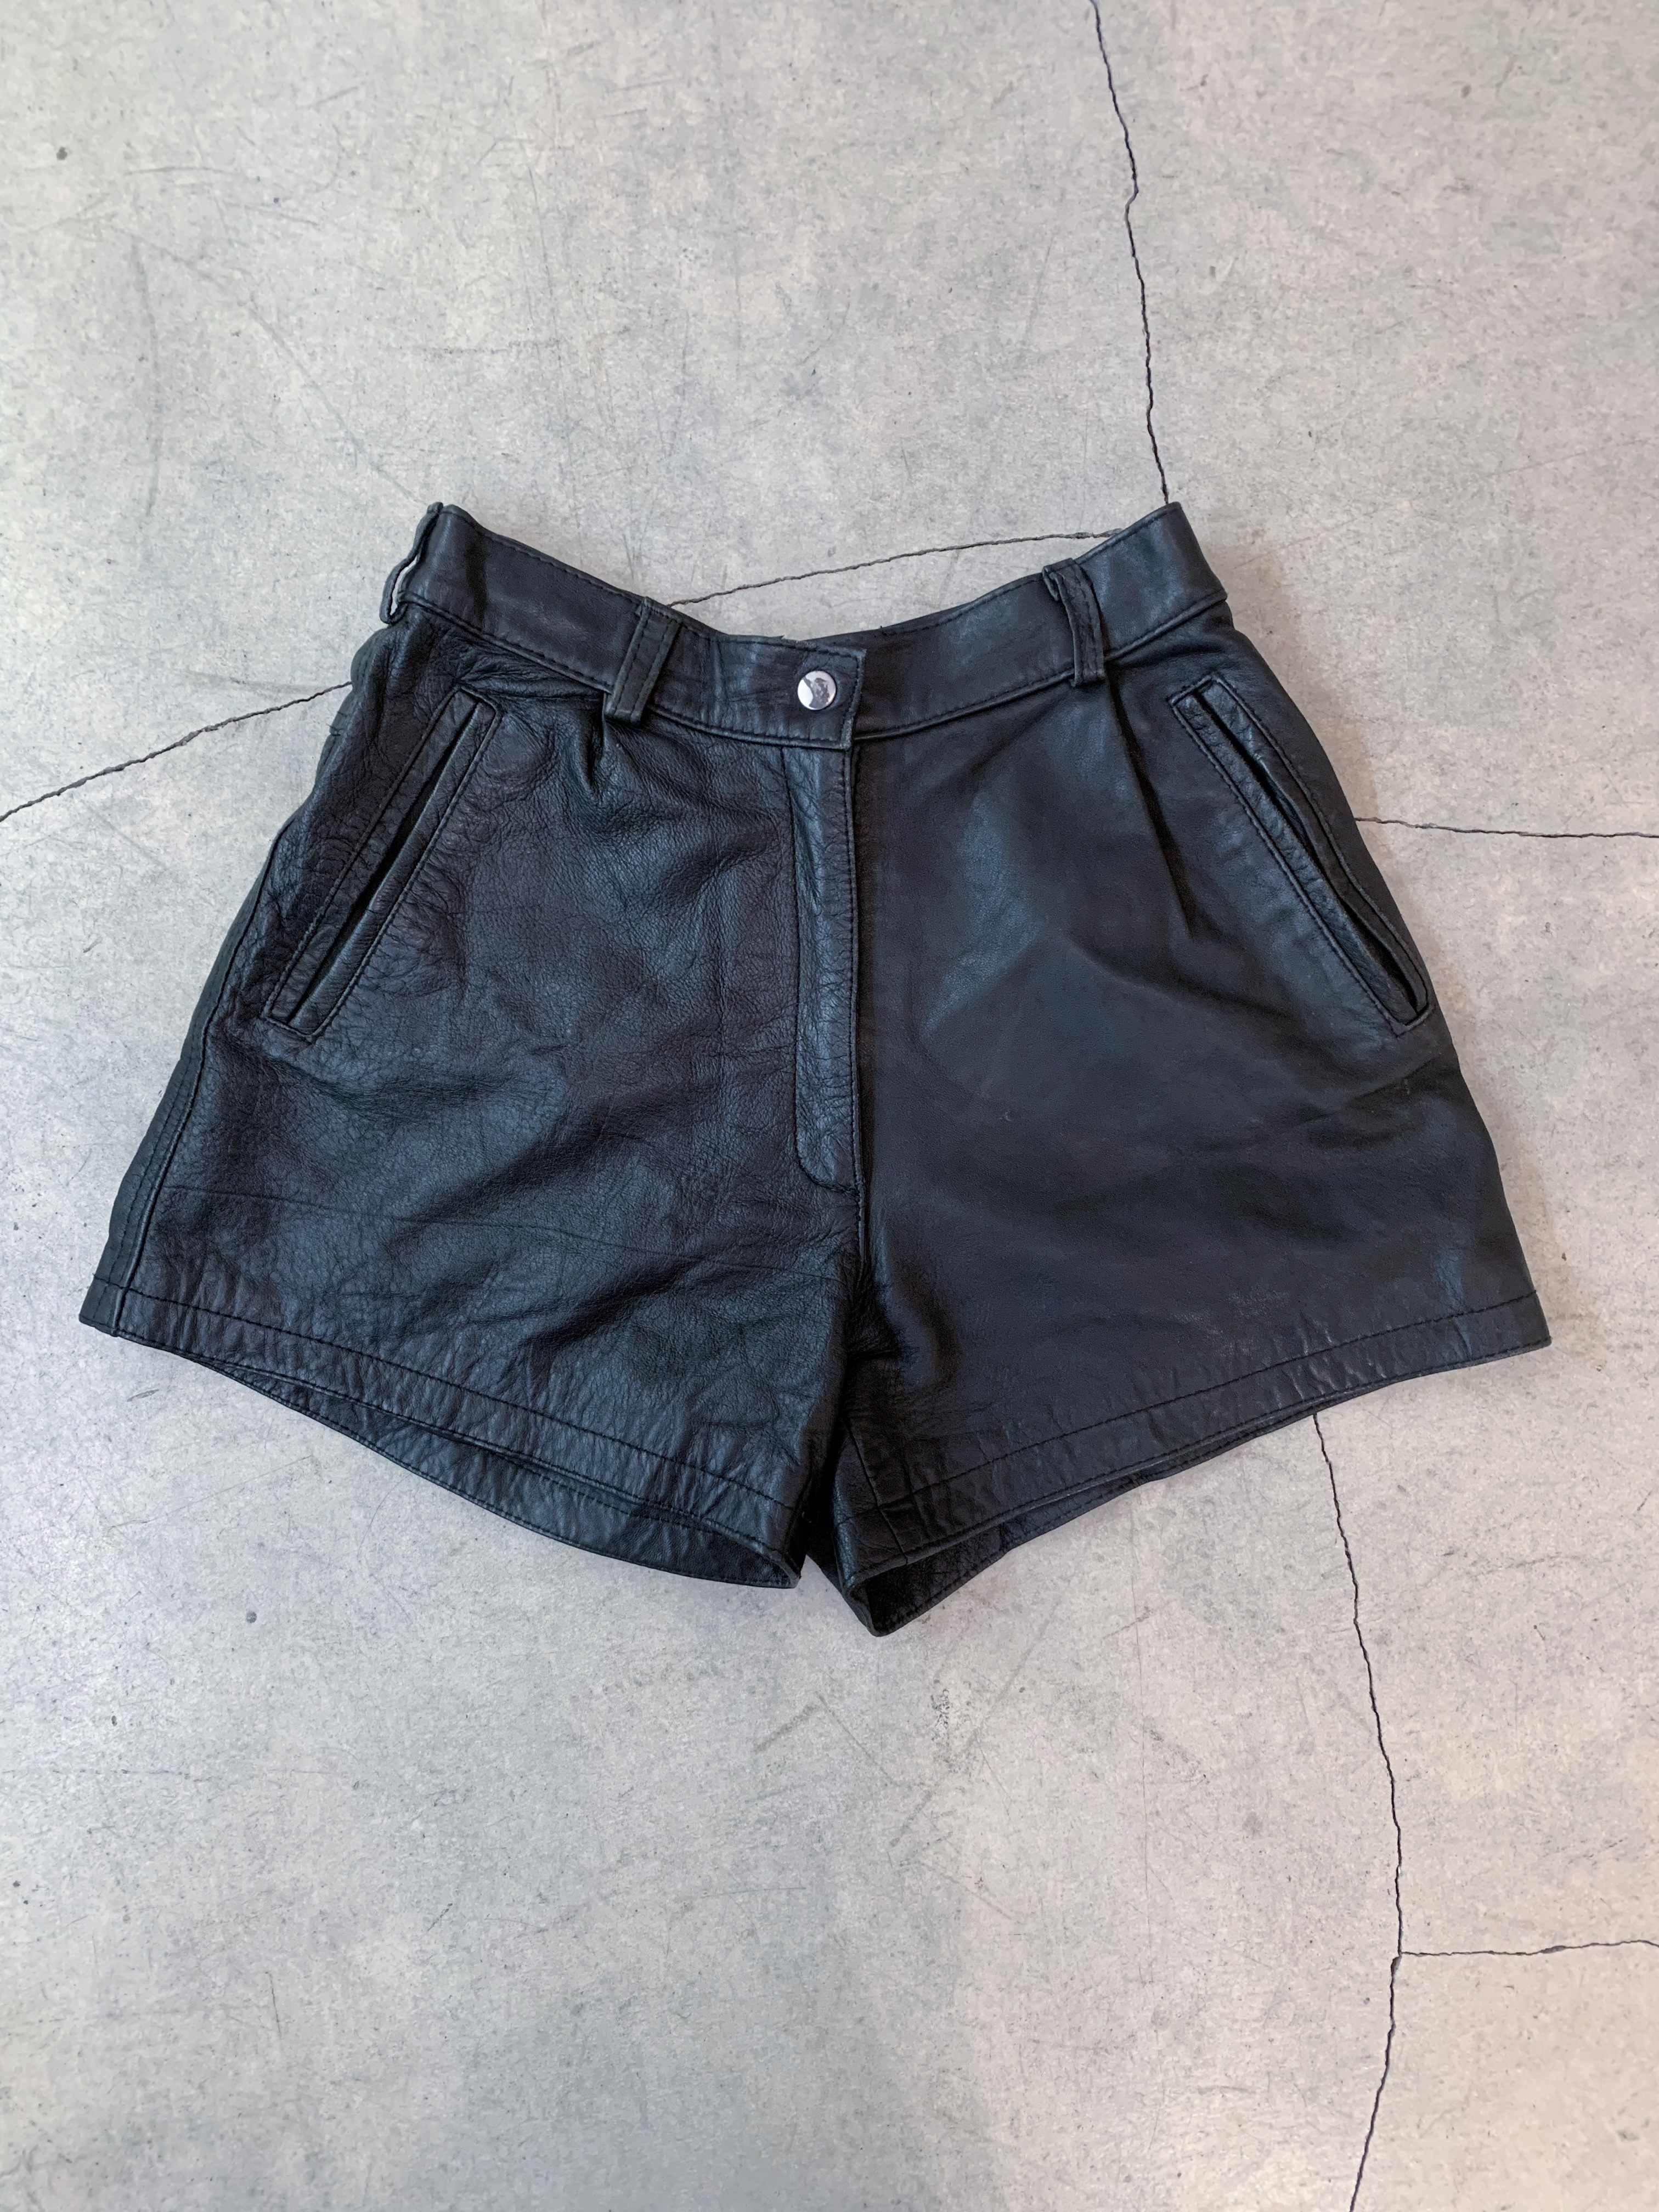 vintage real leather short pants